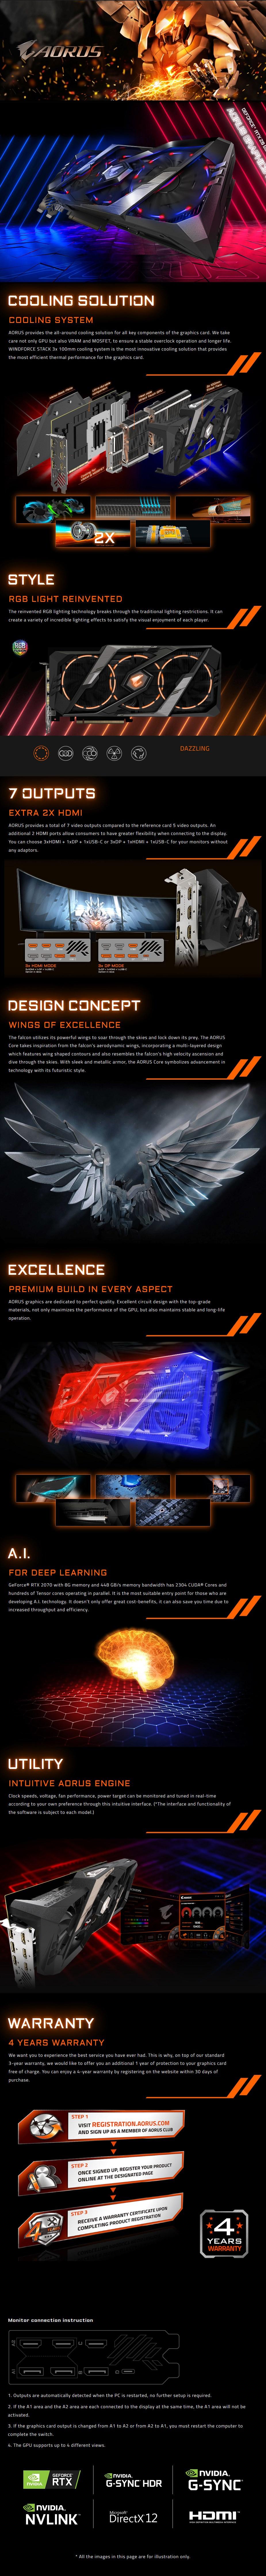 Gigabyte AORUS GeForce RTX 2070 8GB Video Card - Desktop Overview 1